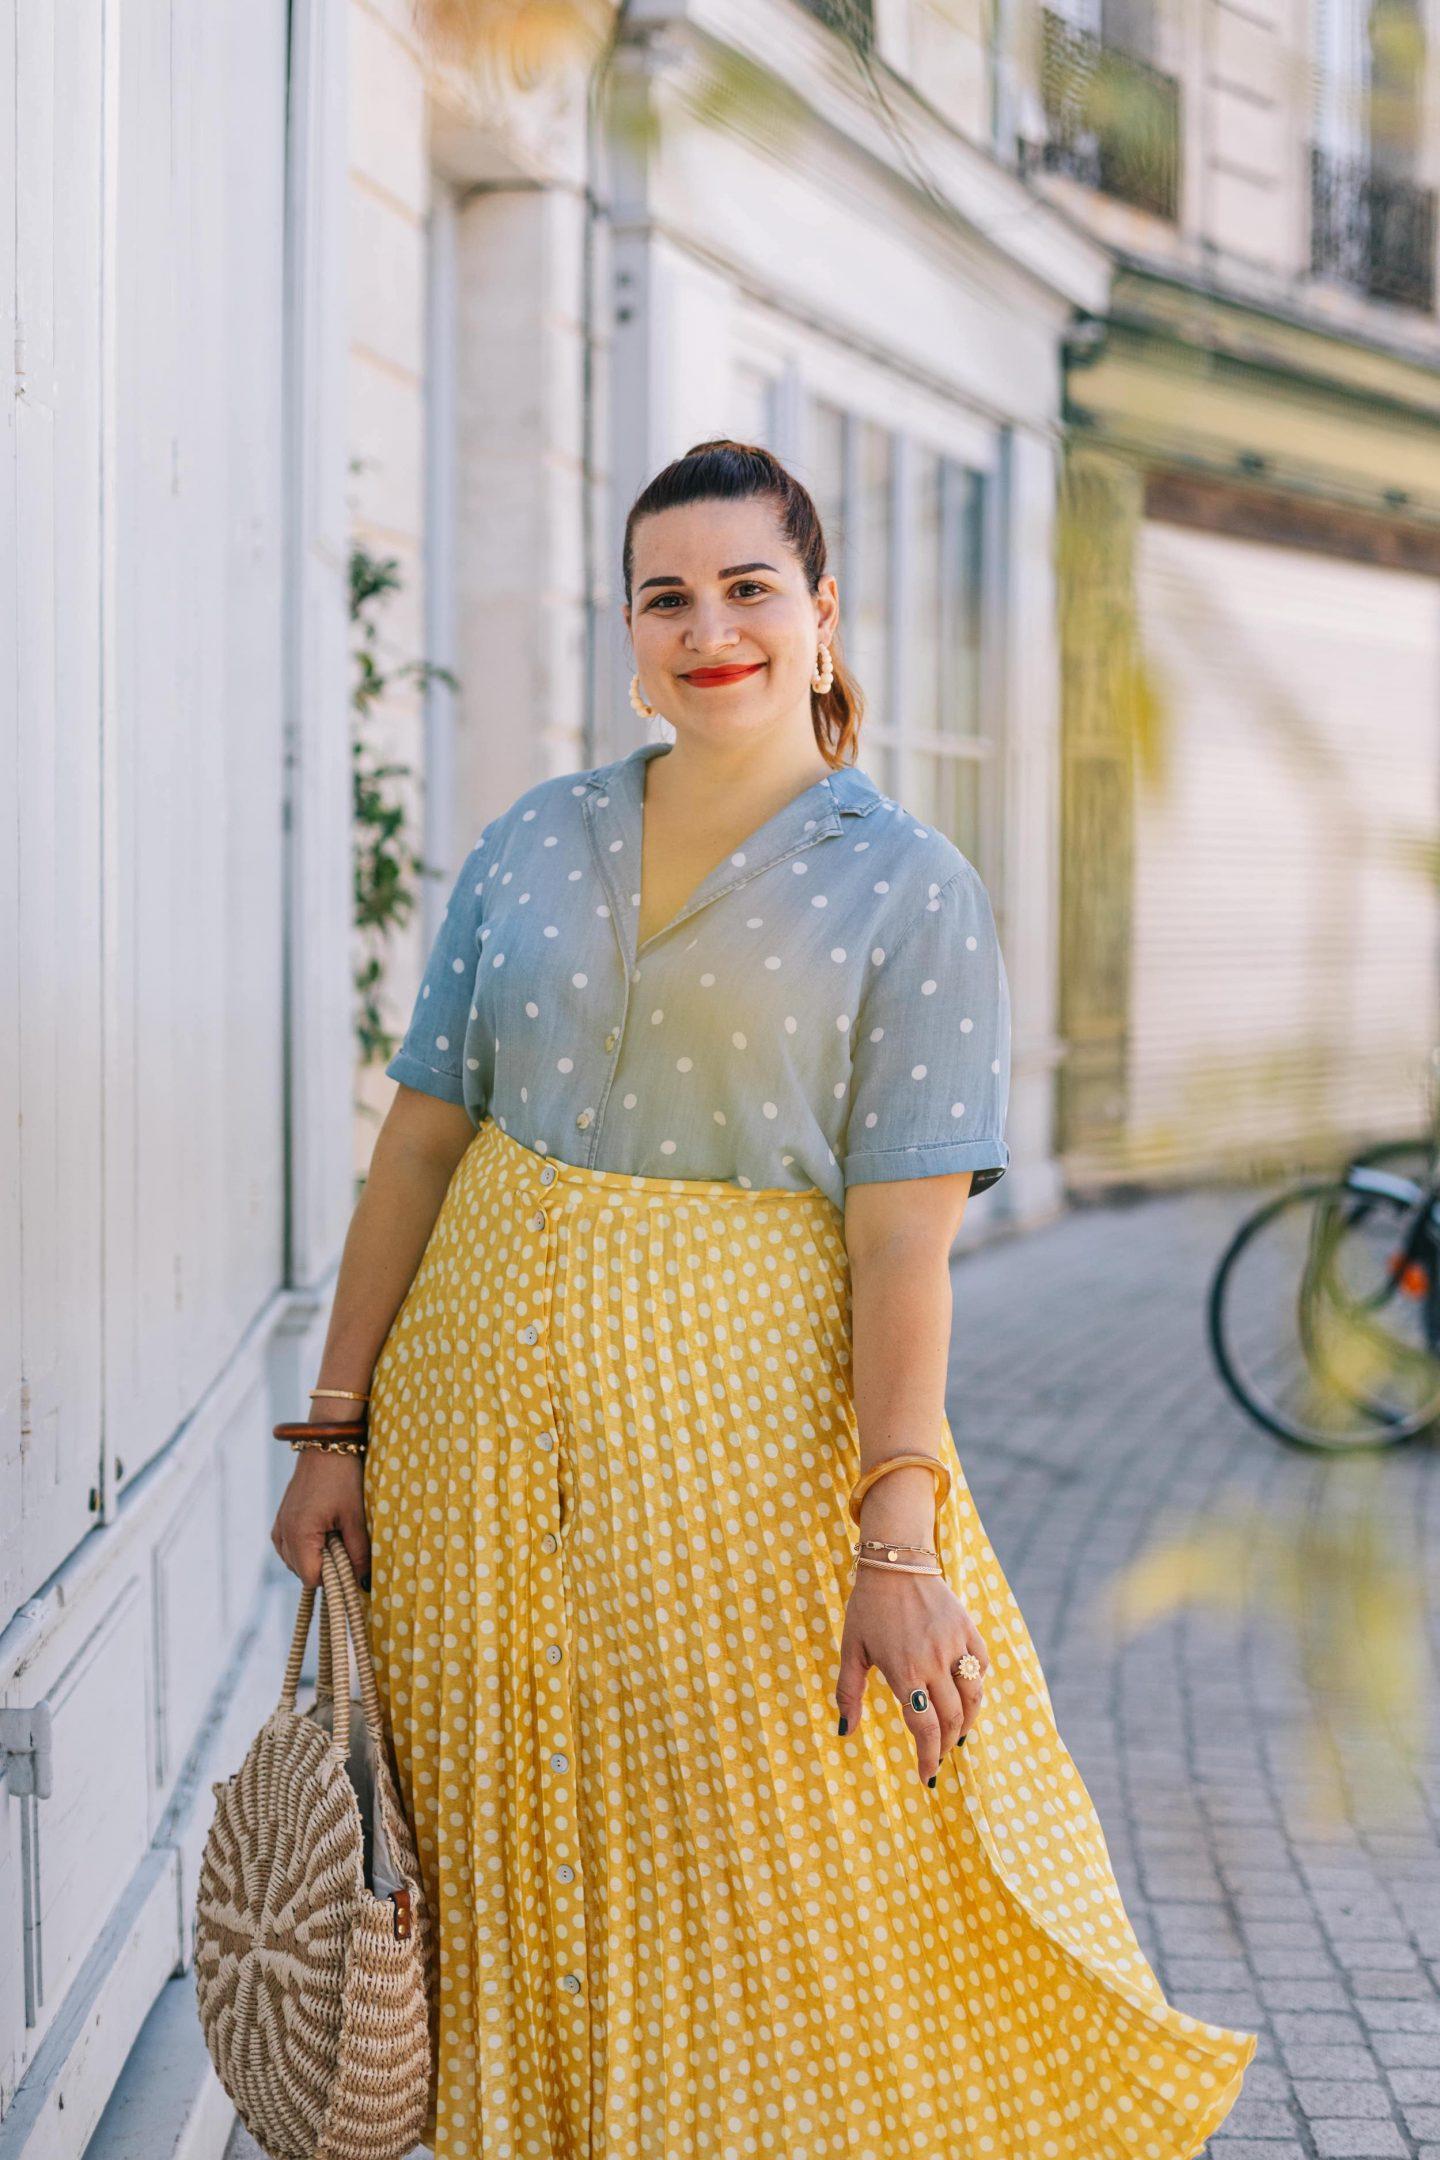 s'habiller-en-jaune-quand-on-est-ronde